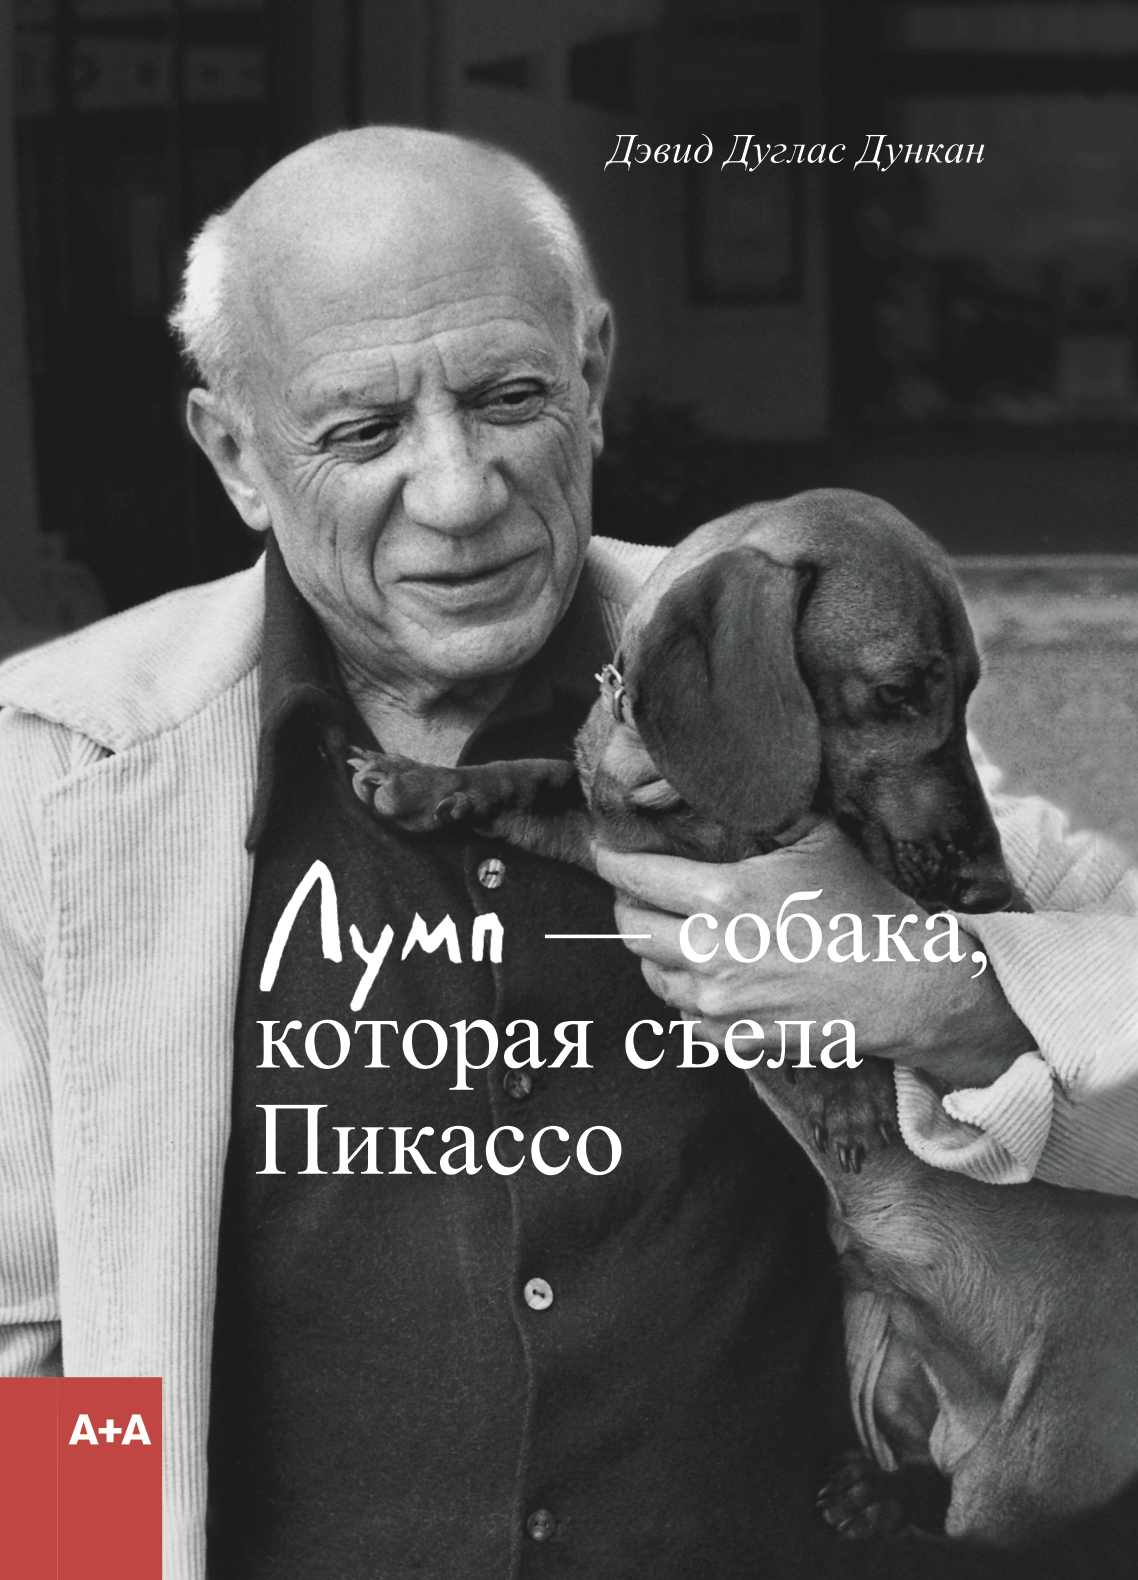 Дункан Лумп - собака, которая съела Пикассо